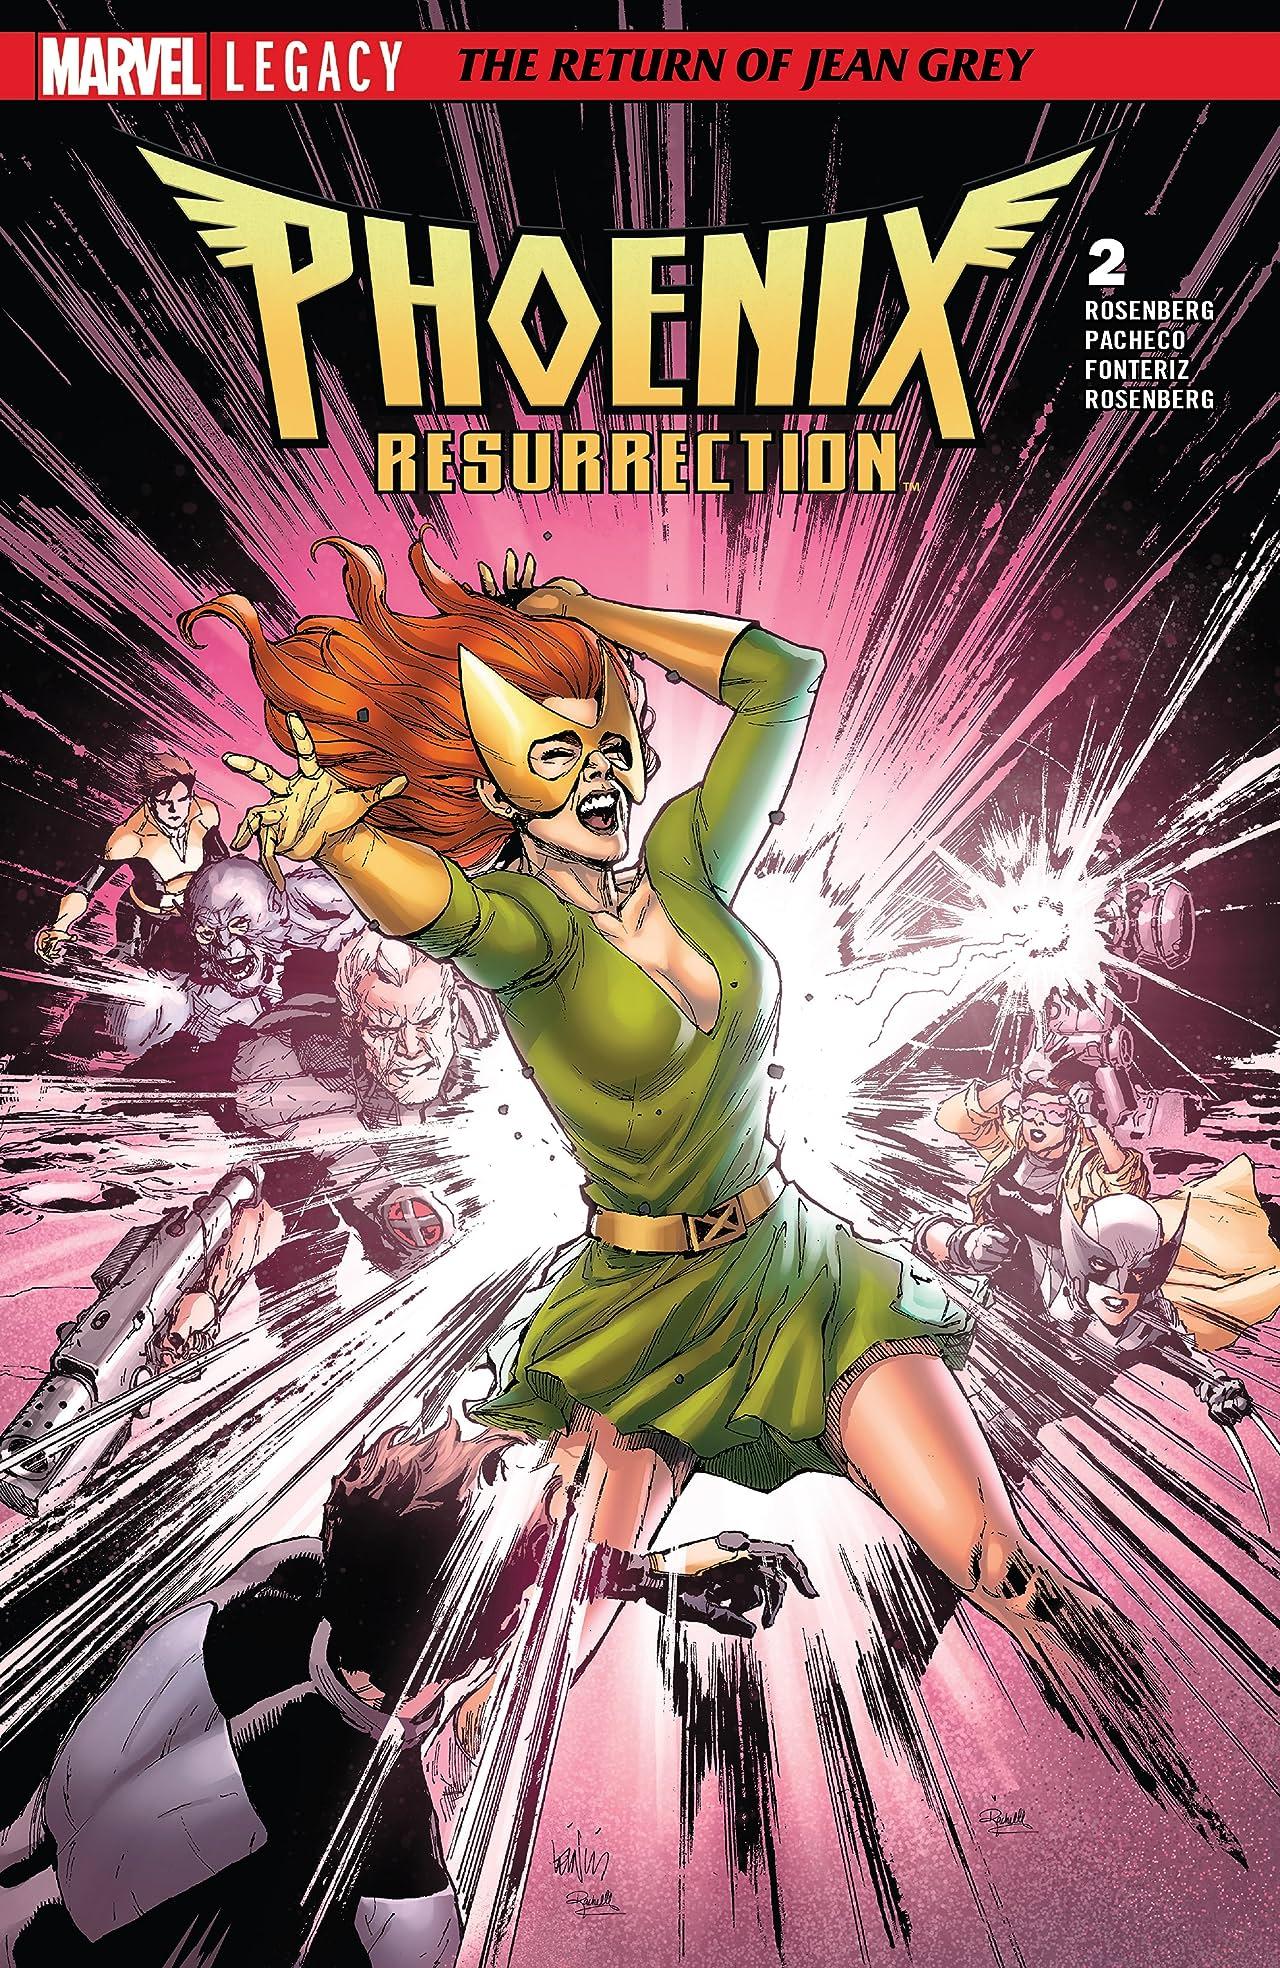 Phoenix Resurrection: The Return Of Jean Grey